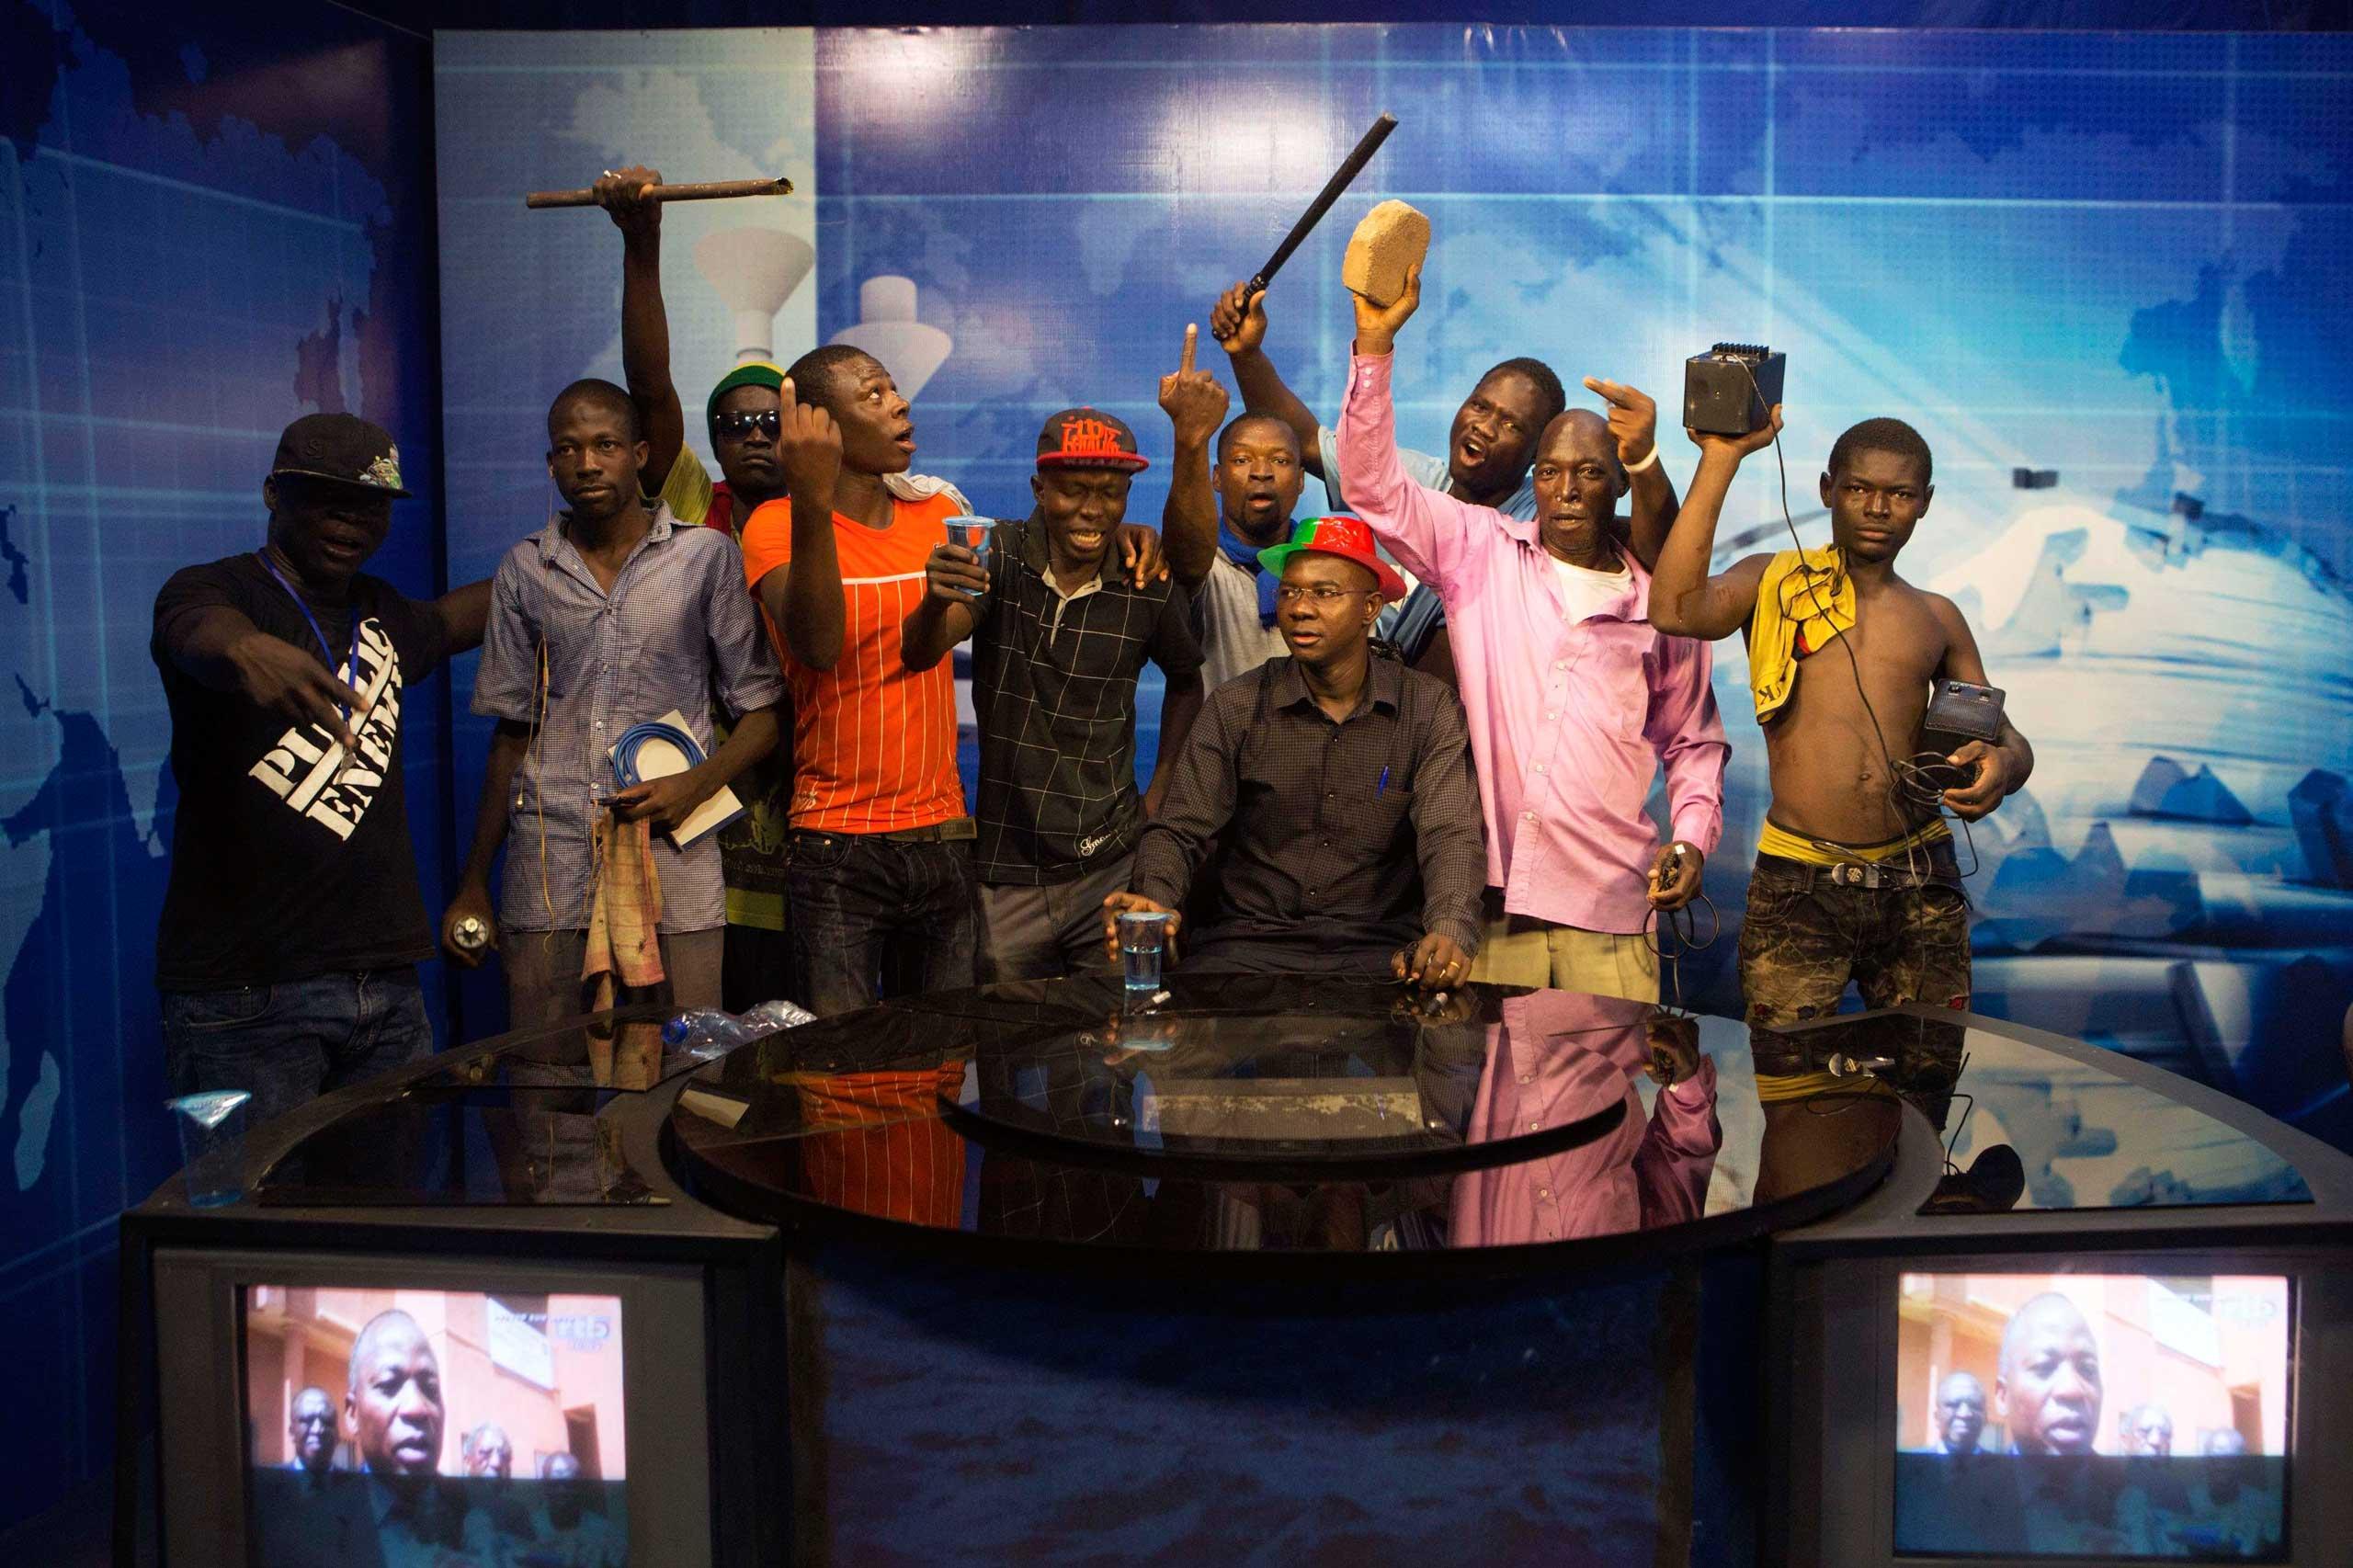 Anti-government protesters take over the state TV podium in Ouagadougou, capital of Burkina Faso, Oct. 30, 2014.